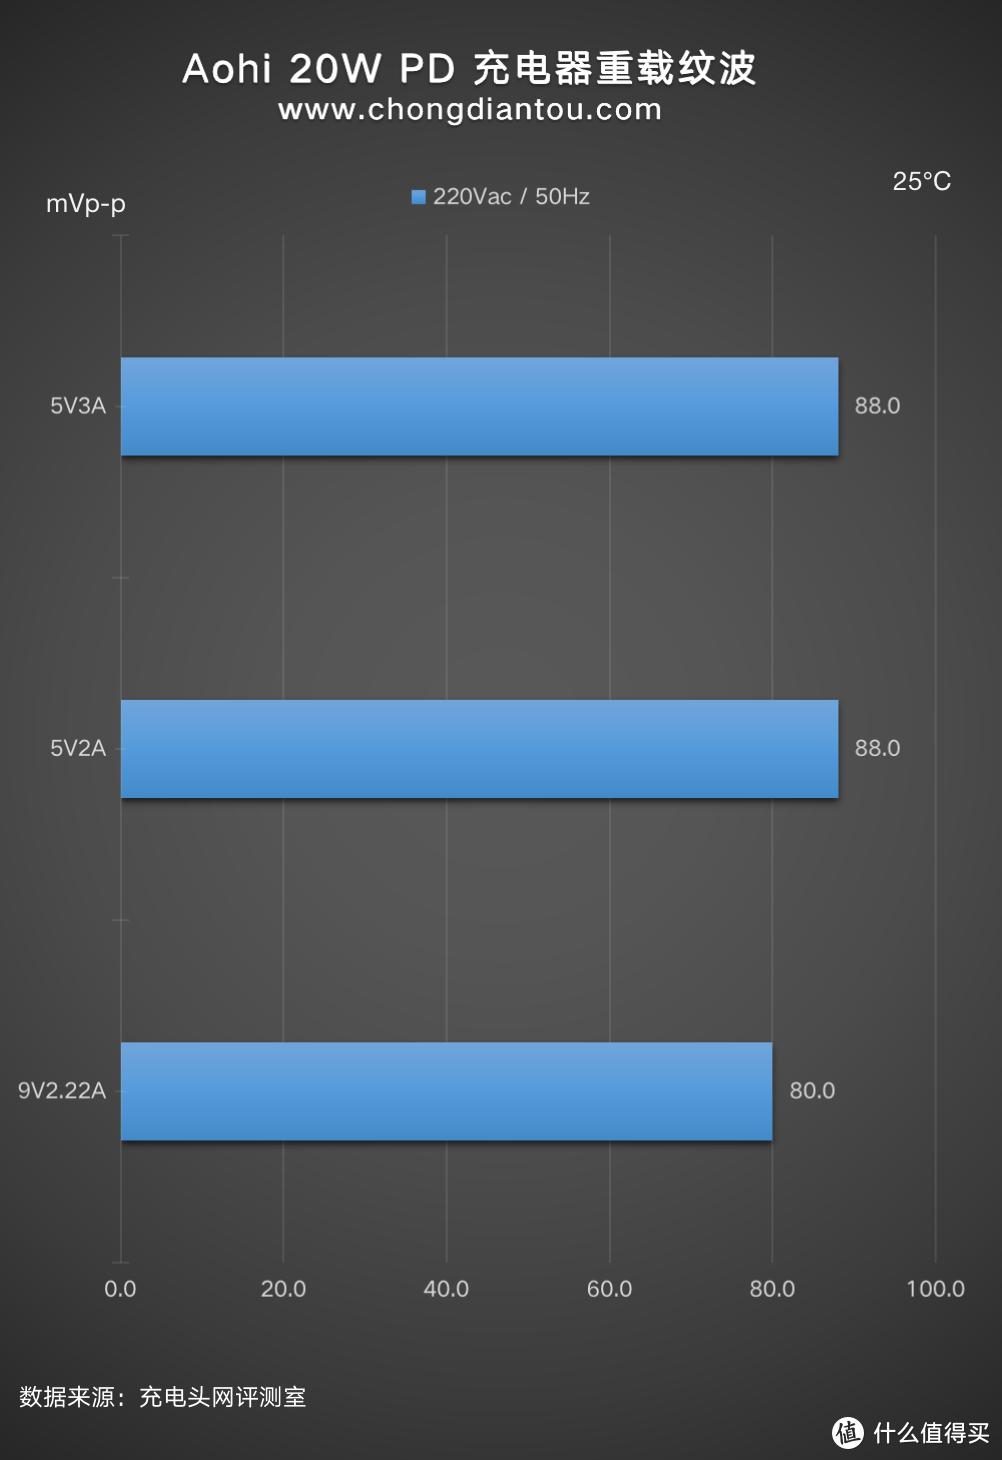 Aohi 20W 快充头评测:20W 快充功率,体积还是那么小巧